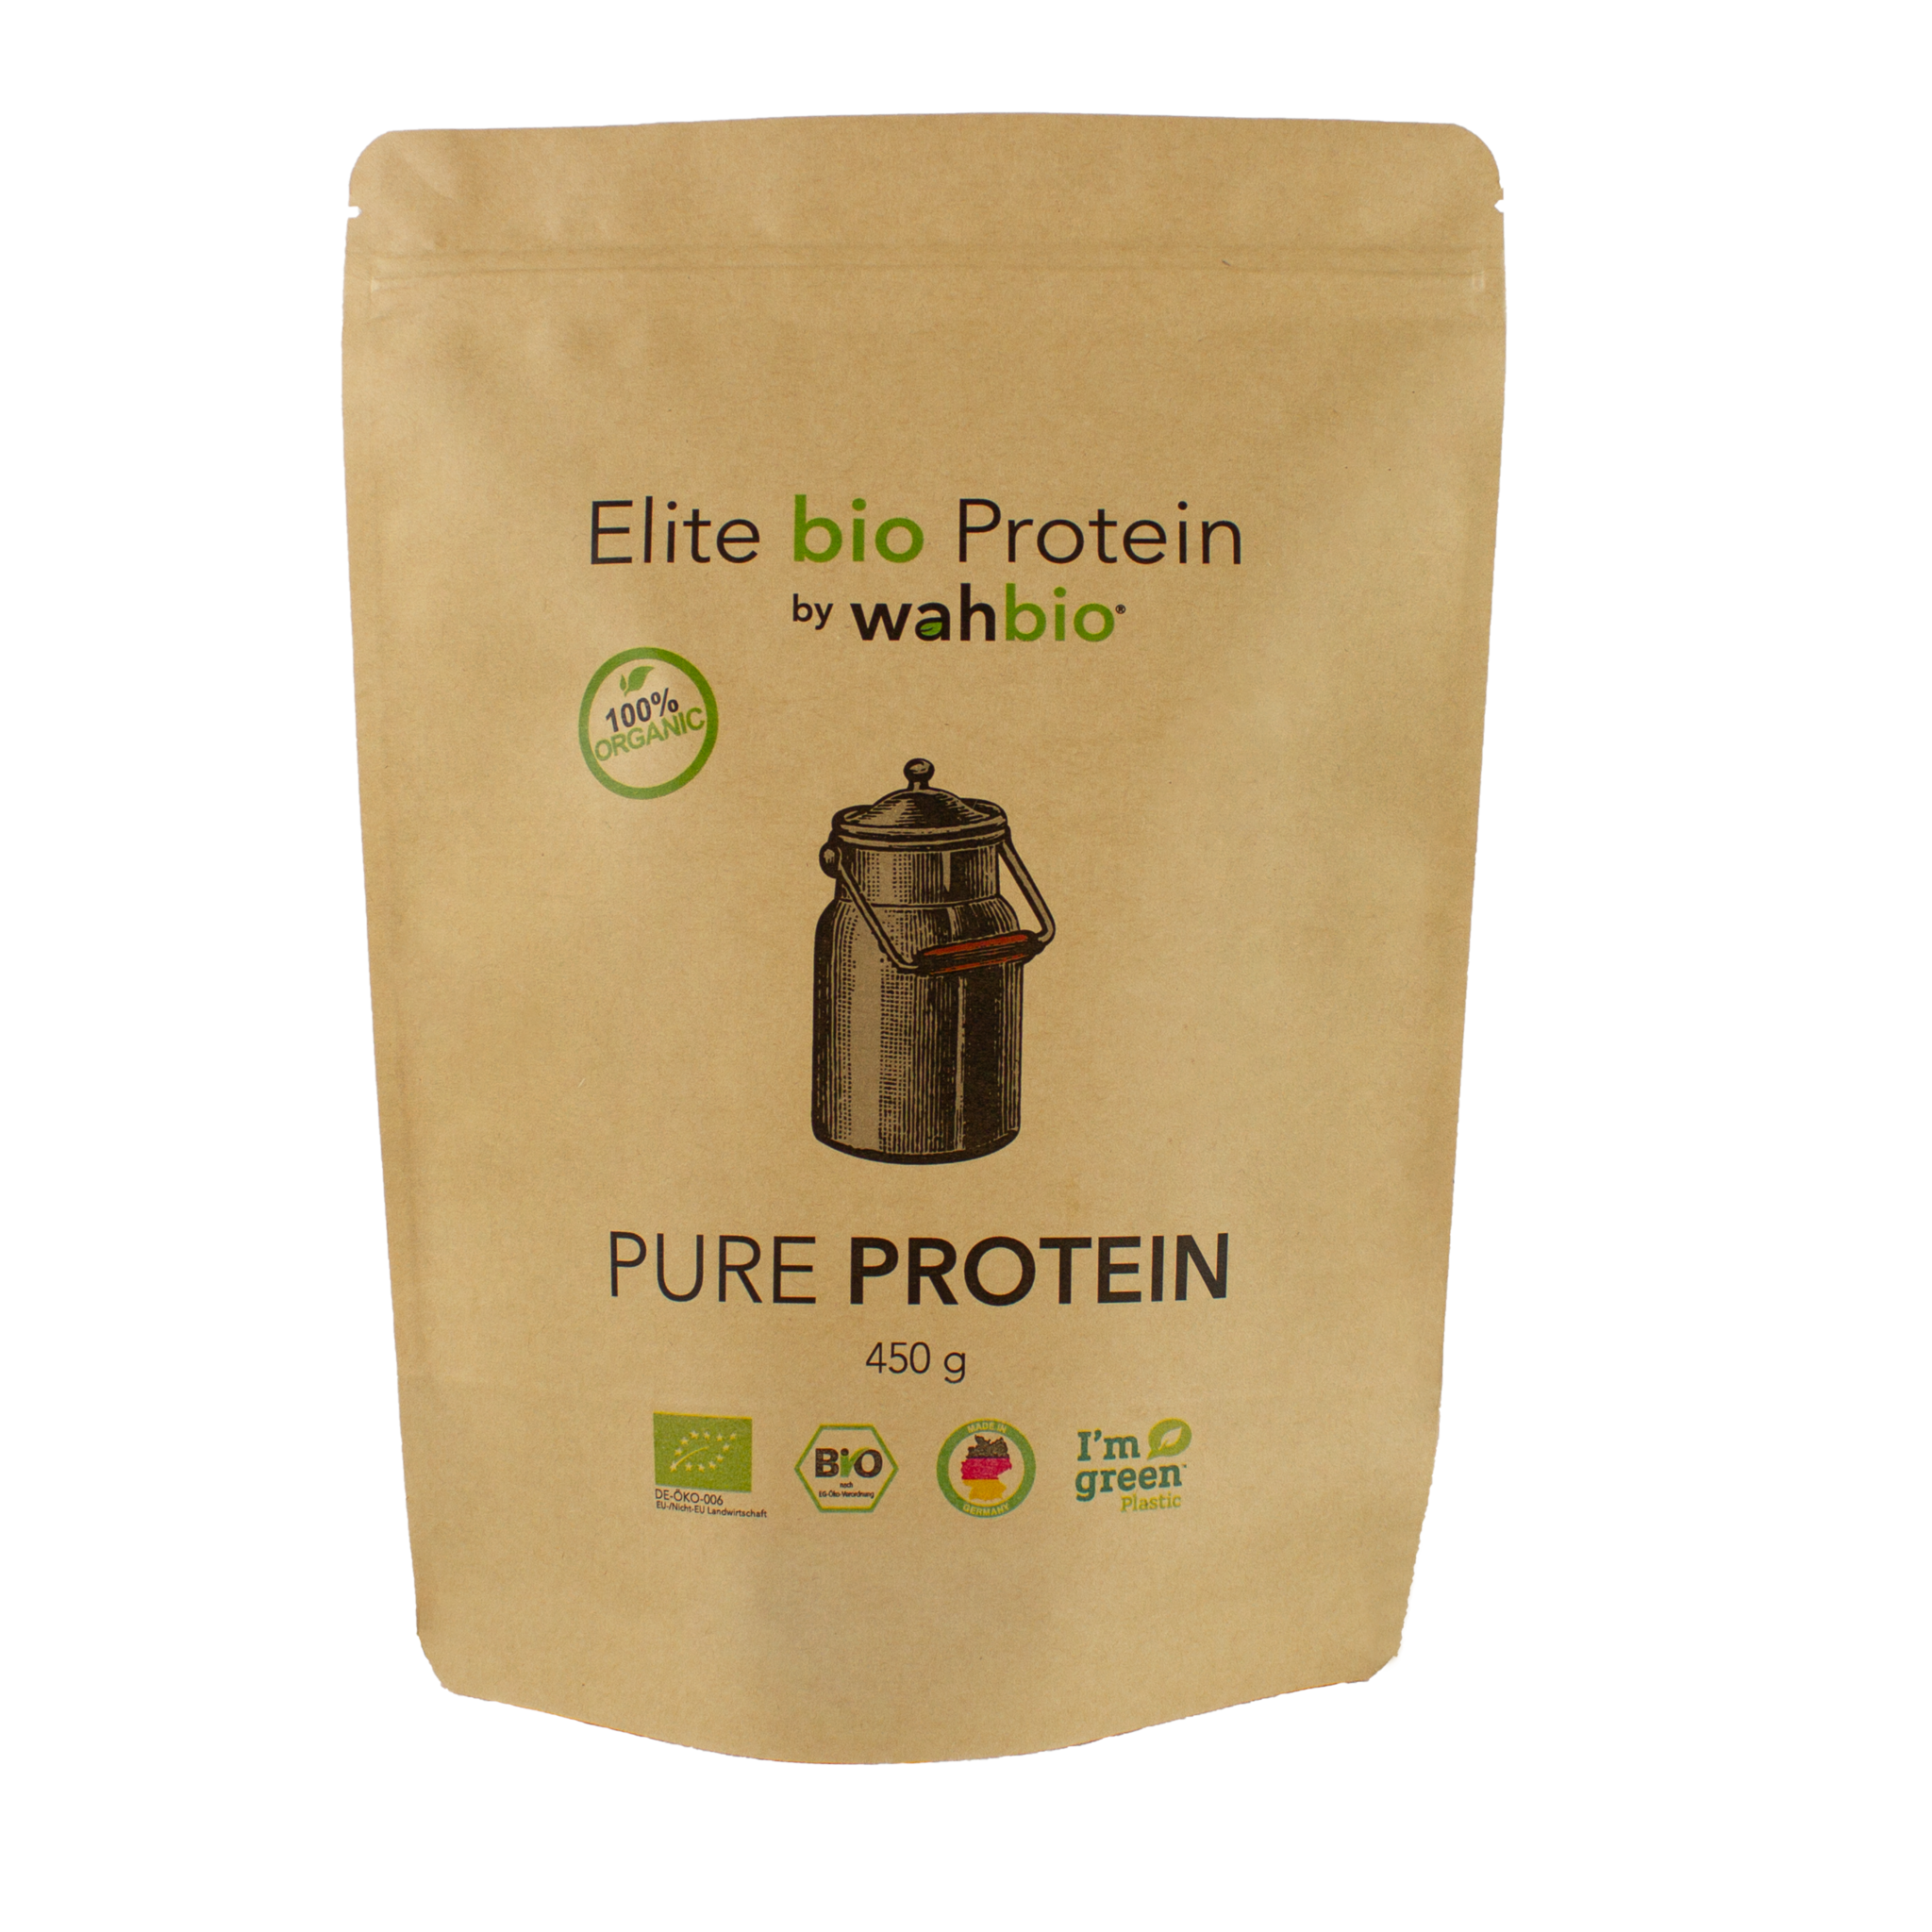 Elite Organic Protein by wahbio | PUR Protein | 450 Gr